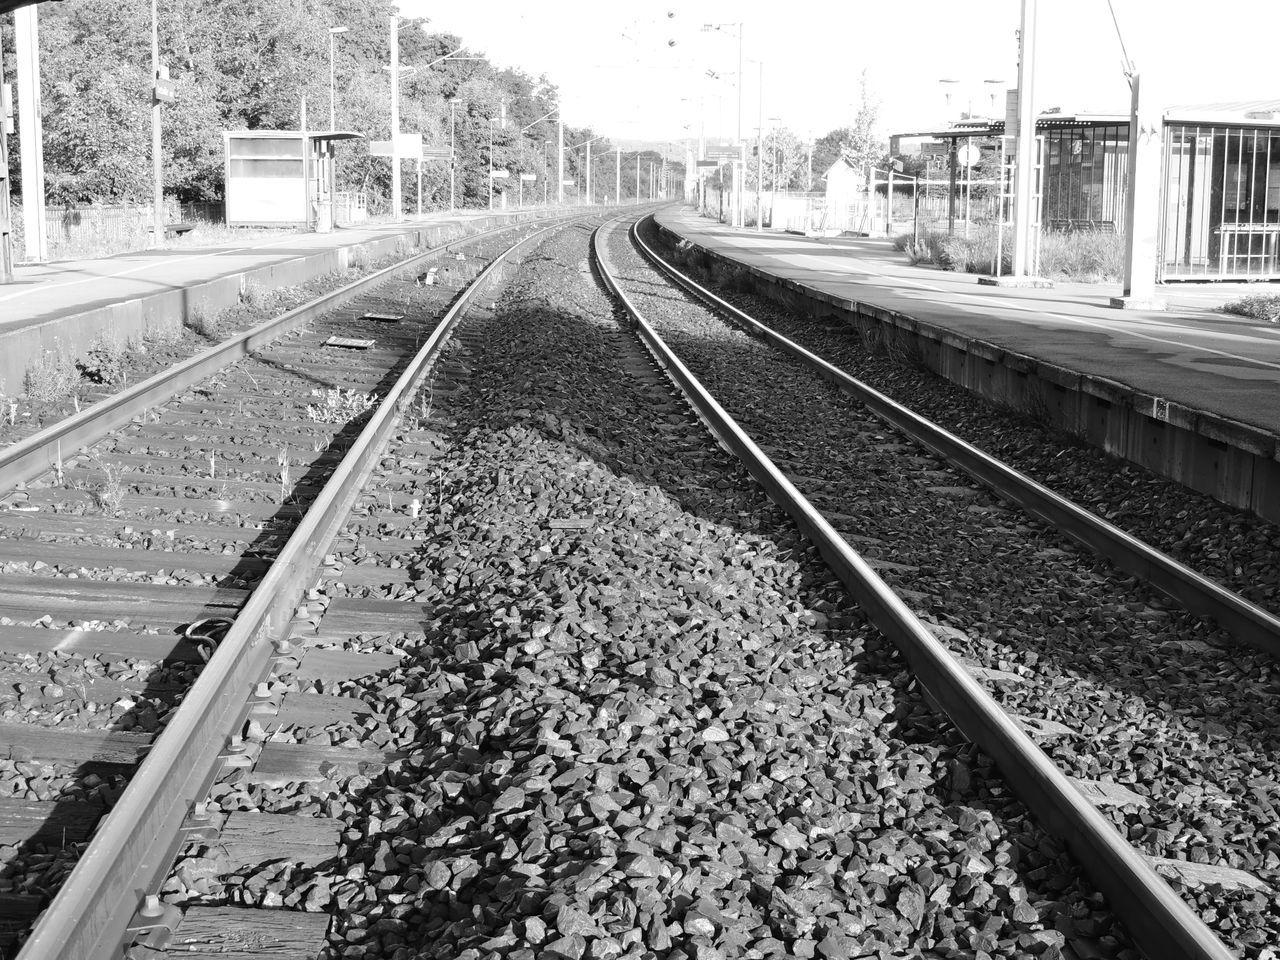 railroad track, transportation, rail transportation, day, railroad tie, public transportation, railway track, outdoors, no people